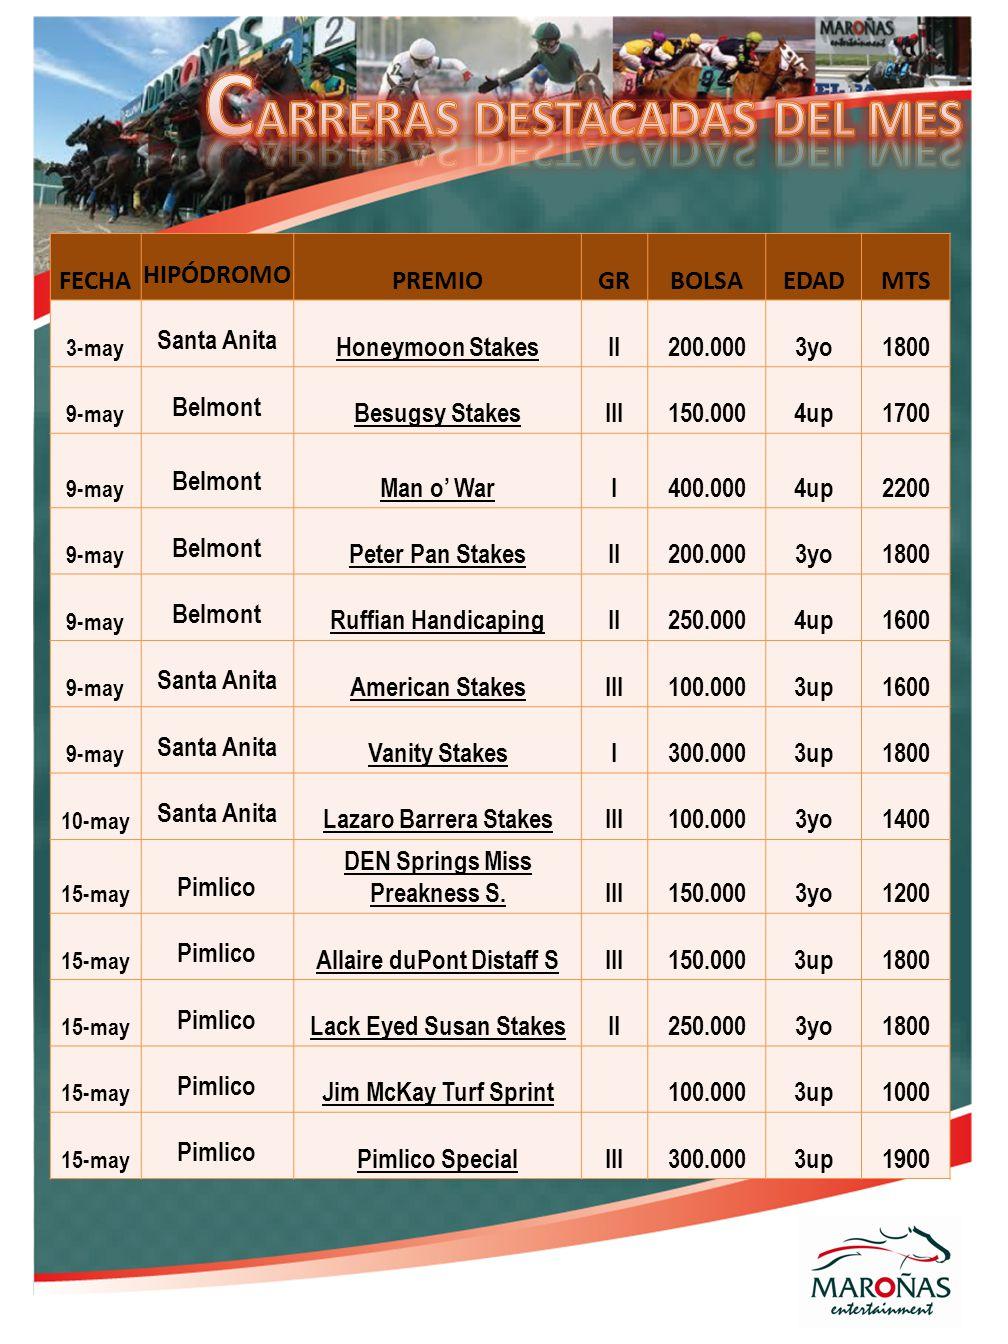 FECHA HIPÓDROMO PREMIOGRBOLSAEDADMTS 3-may Santa Anita Honeymoon StakesII200.0003yo1800 9-may Belmont Besugsy StakesIII150.0004up1700 9-may Belmont Ma